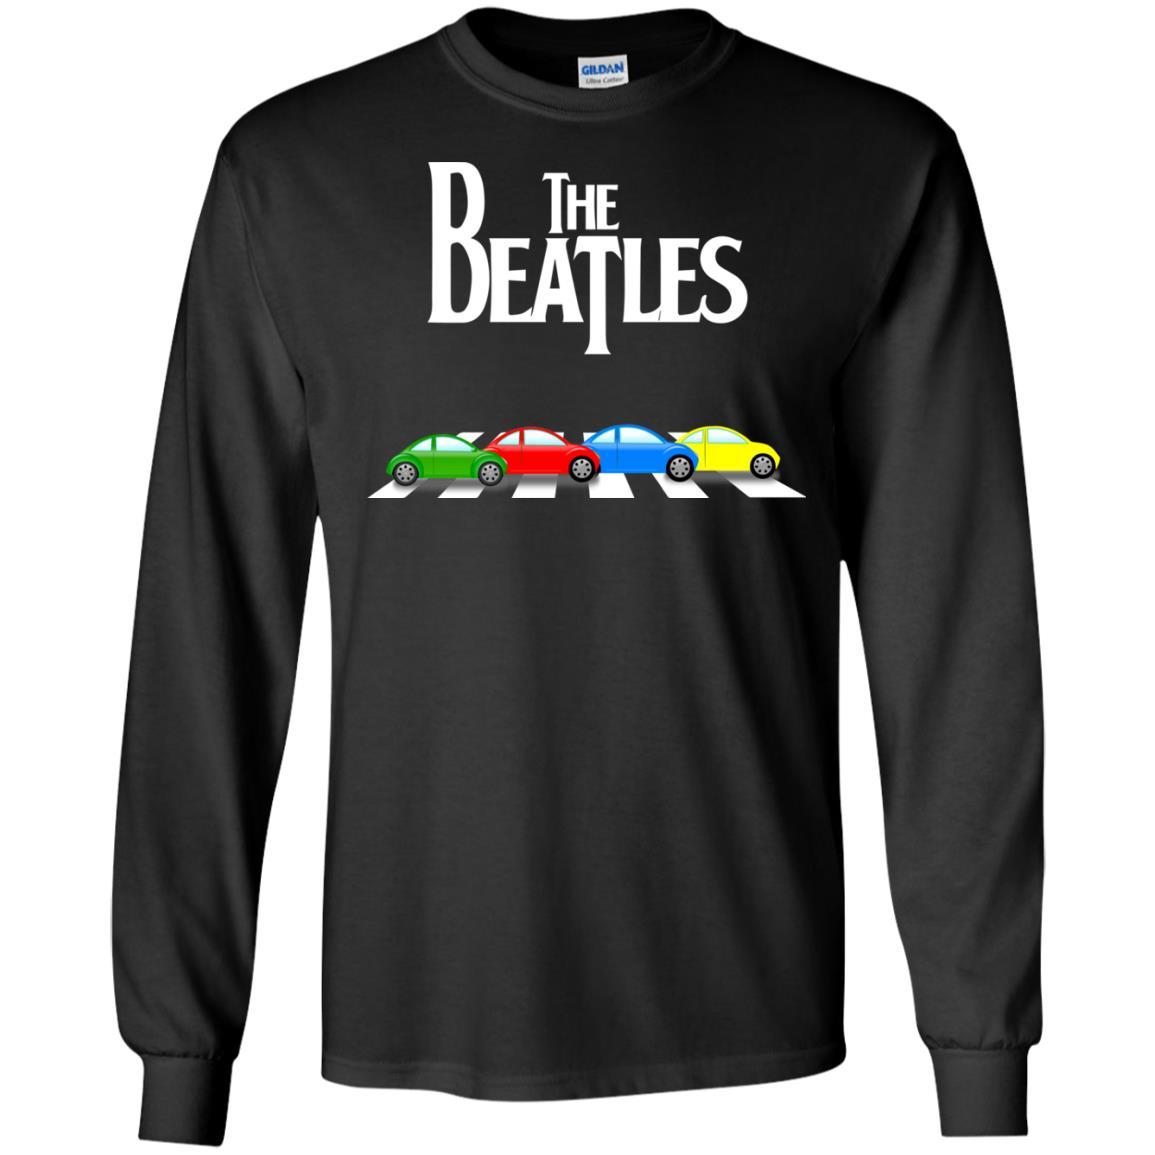 image 328 - The Beatles cars shirt, hoodie, tank